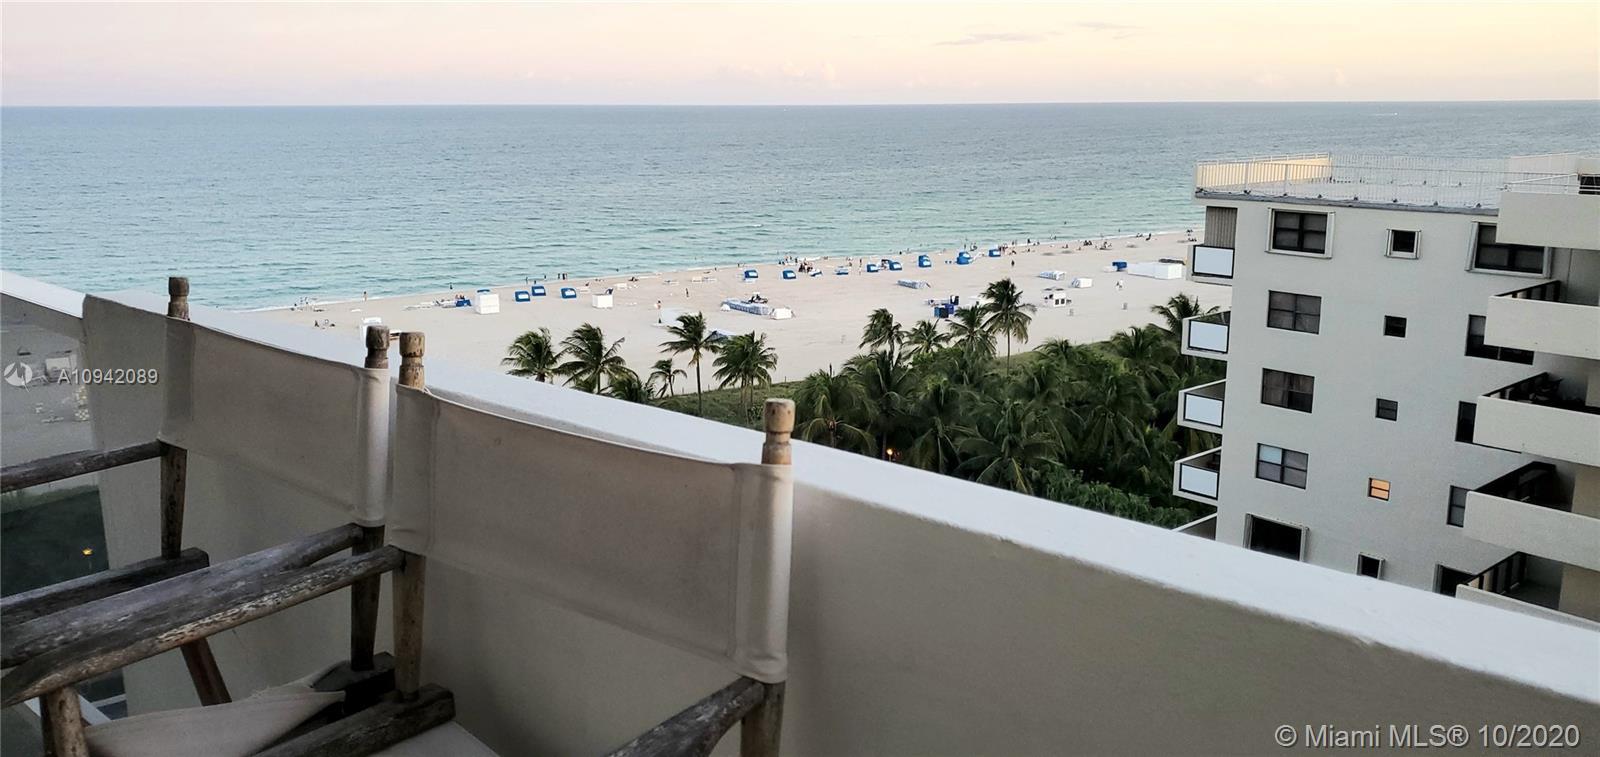 Decoplage #1136 - 100 Lincoln Rd #1136, Miami Beach, FL 33139